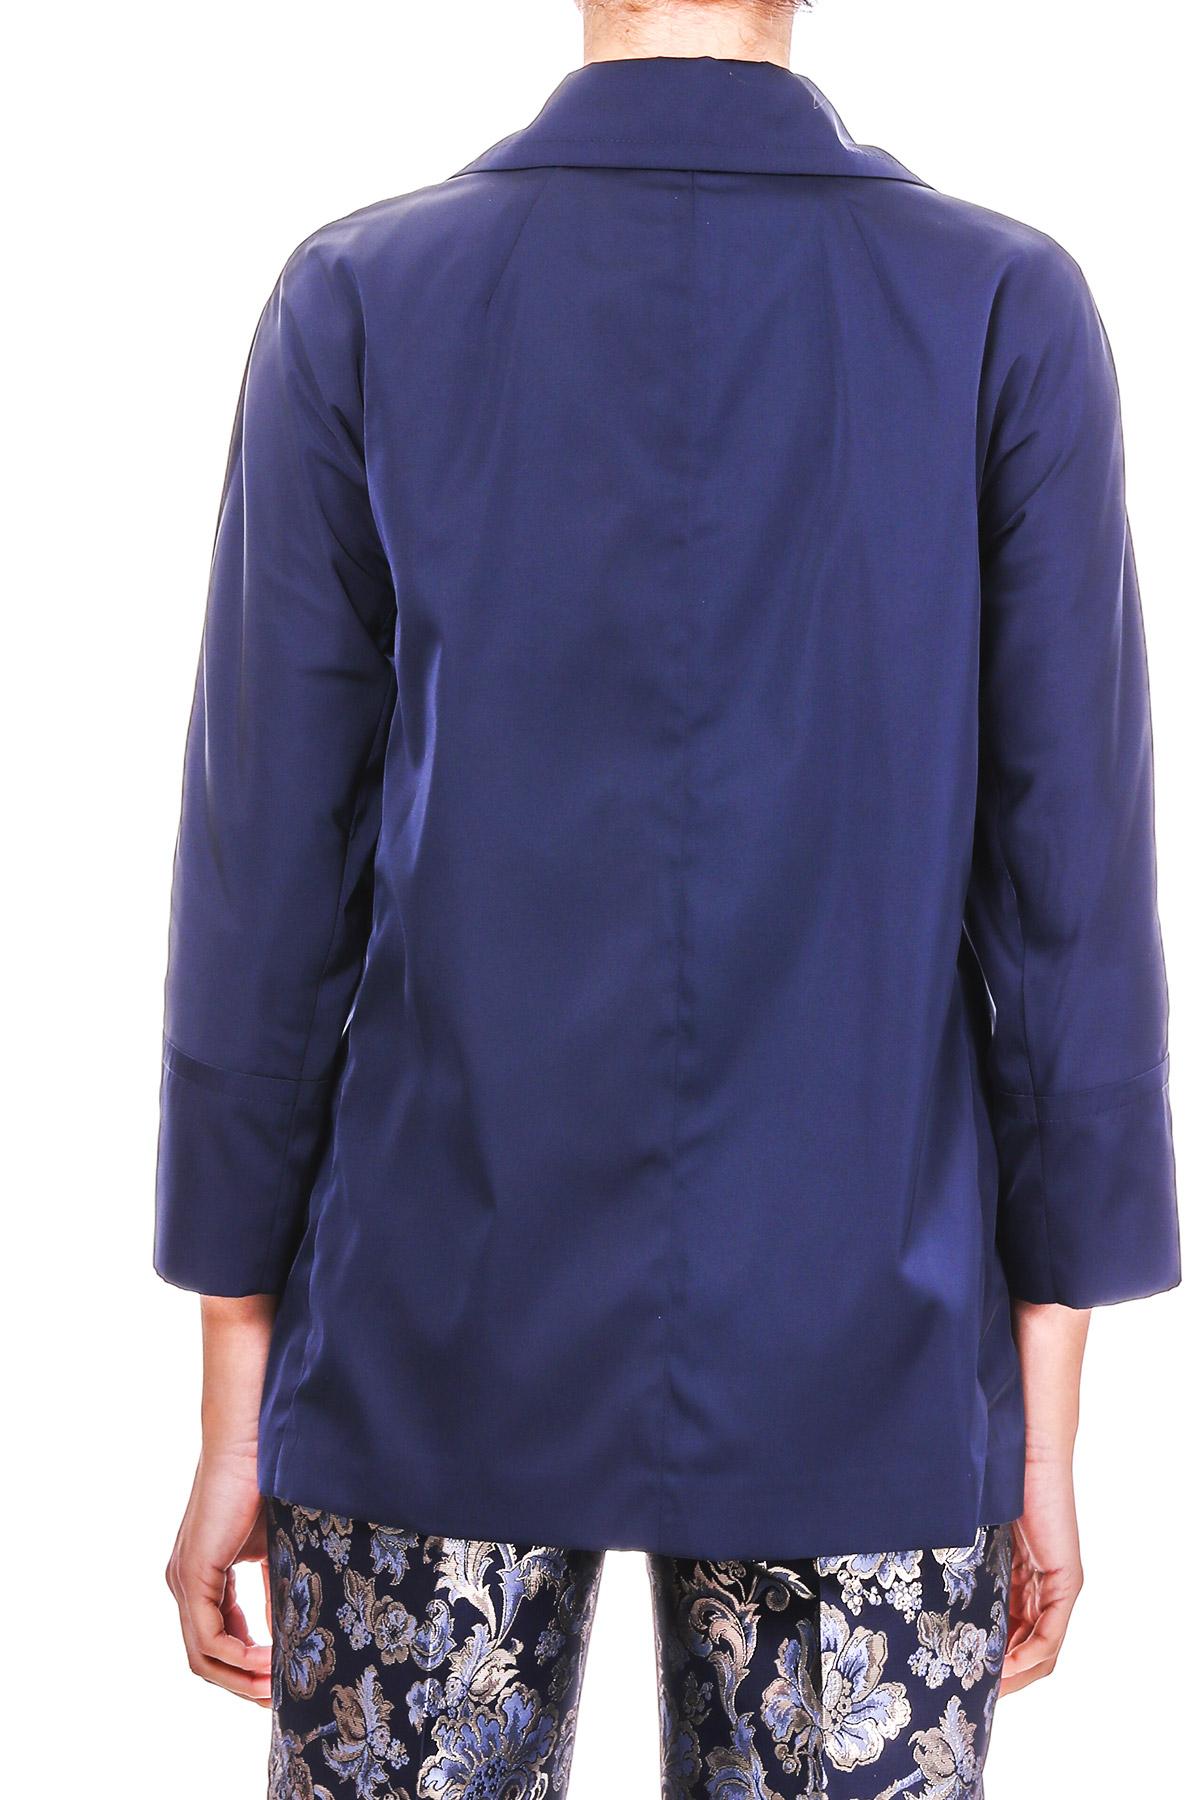 RADZMIR JACKET MAX MARA'S   Jackets   SALITA90410391000005